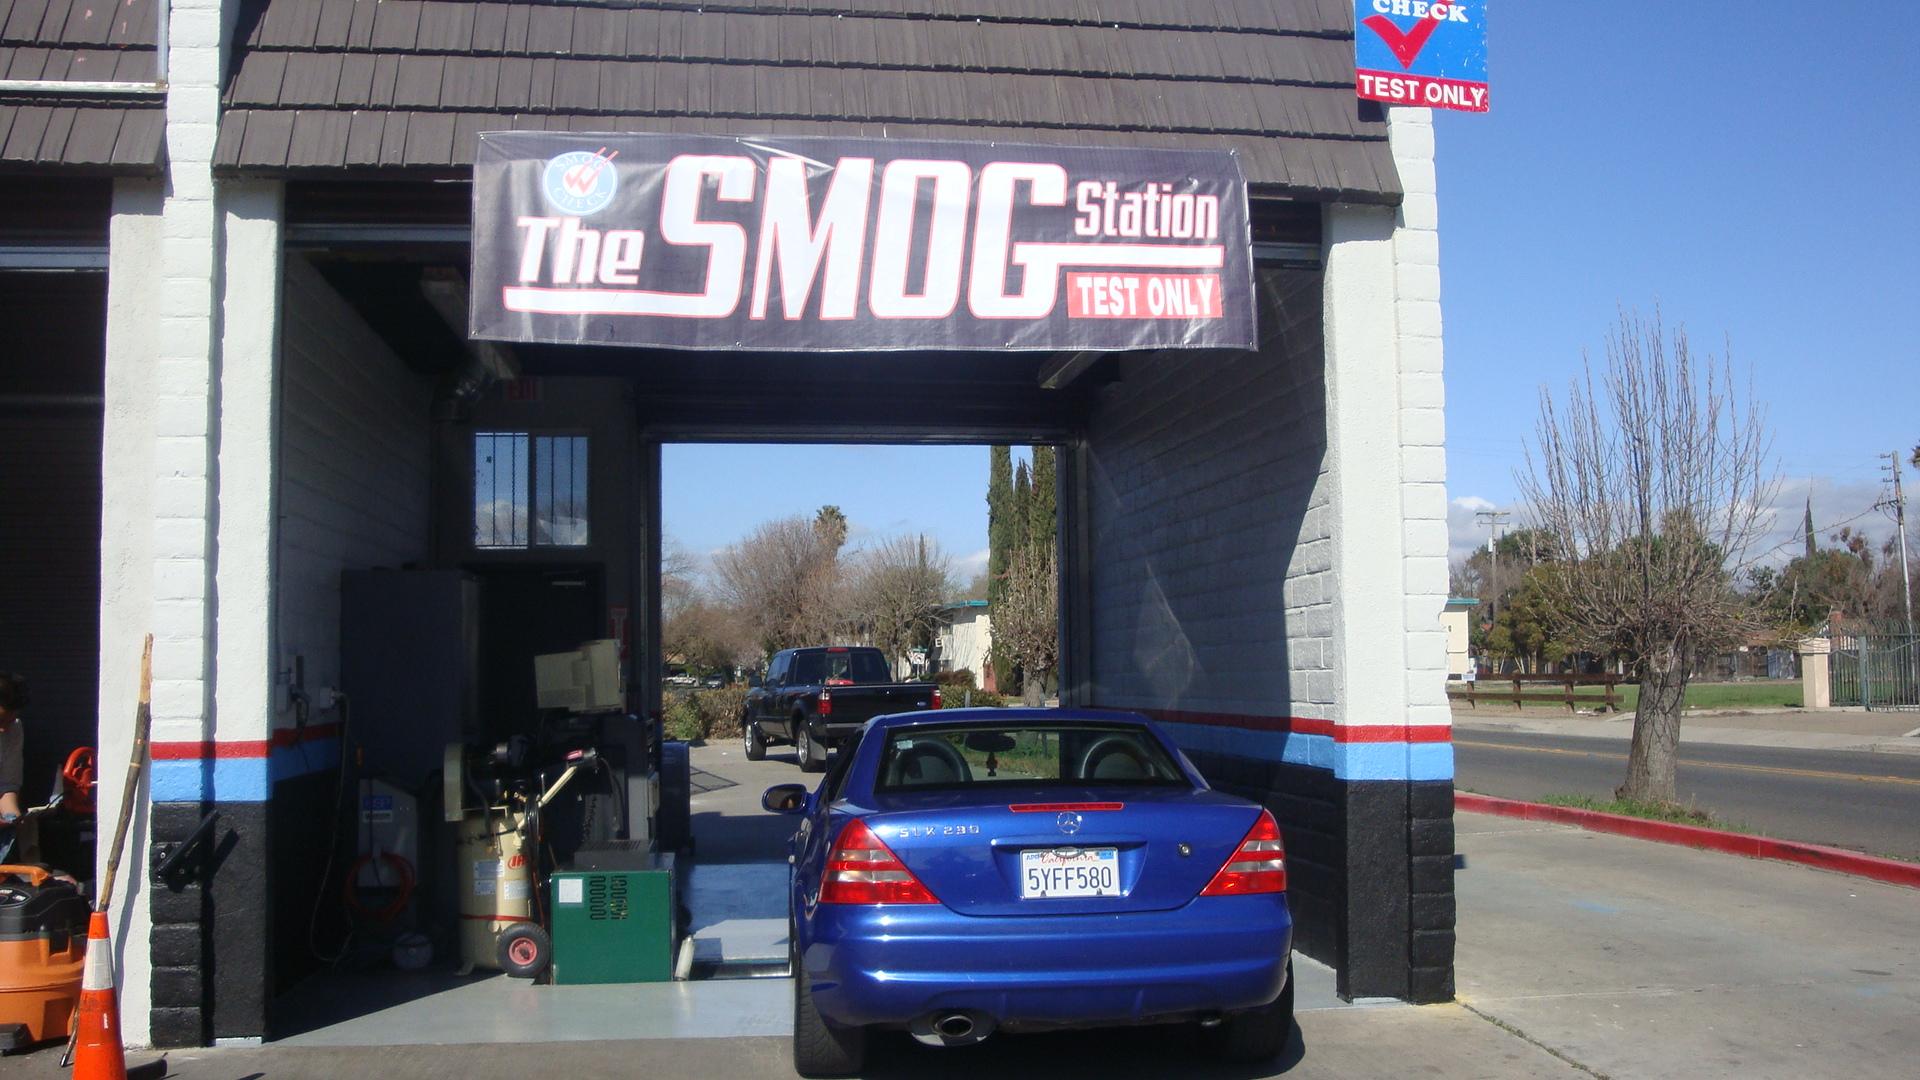 The Smog Station